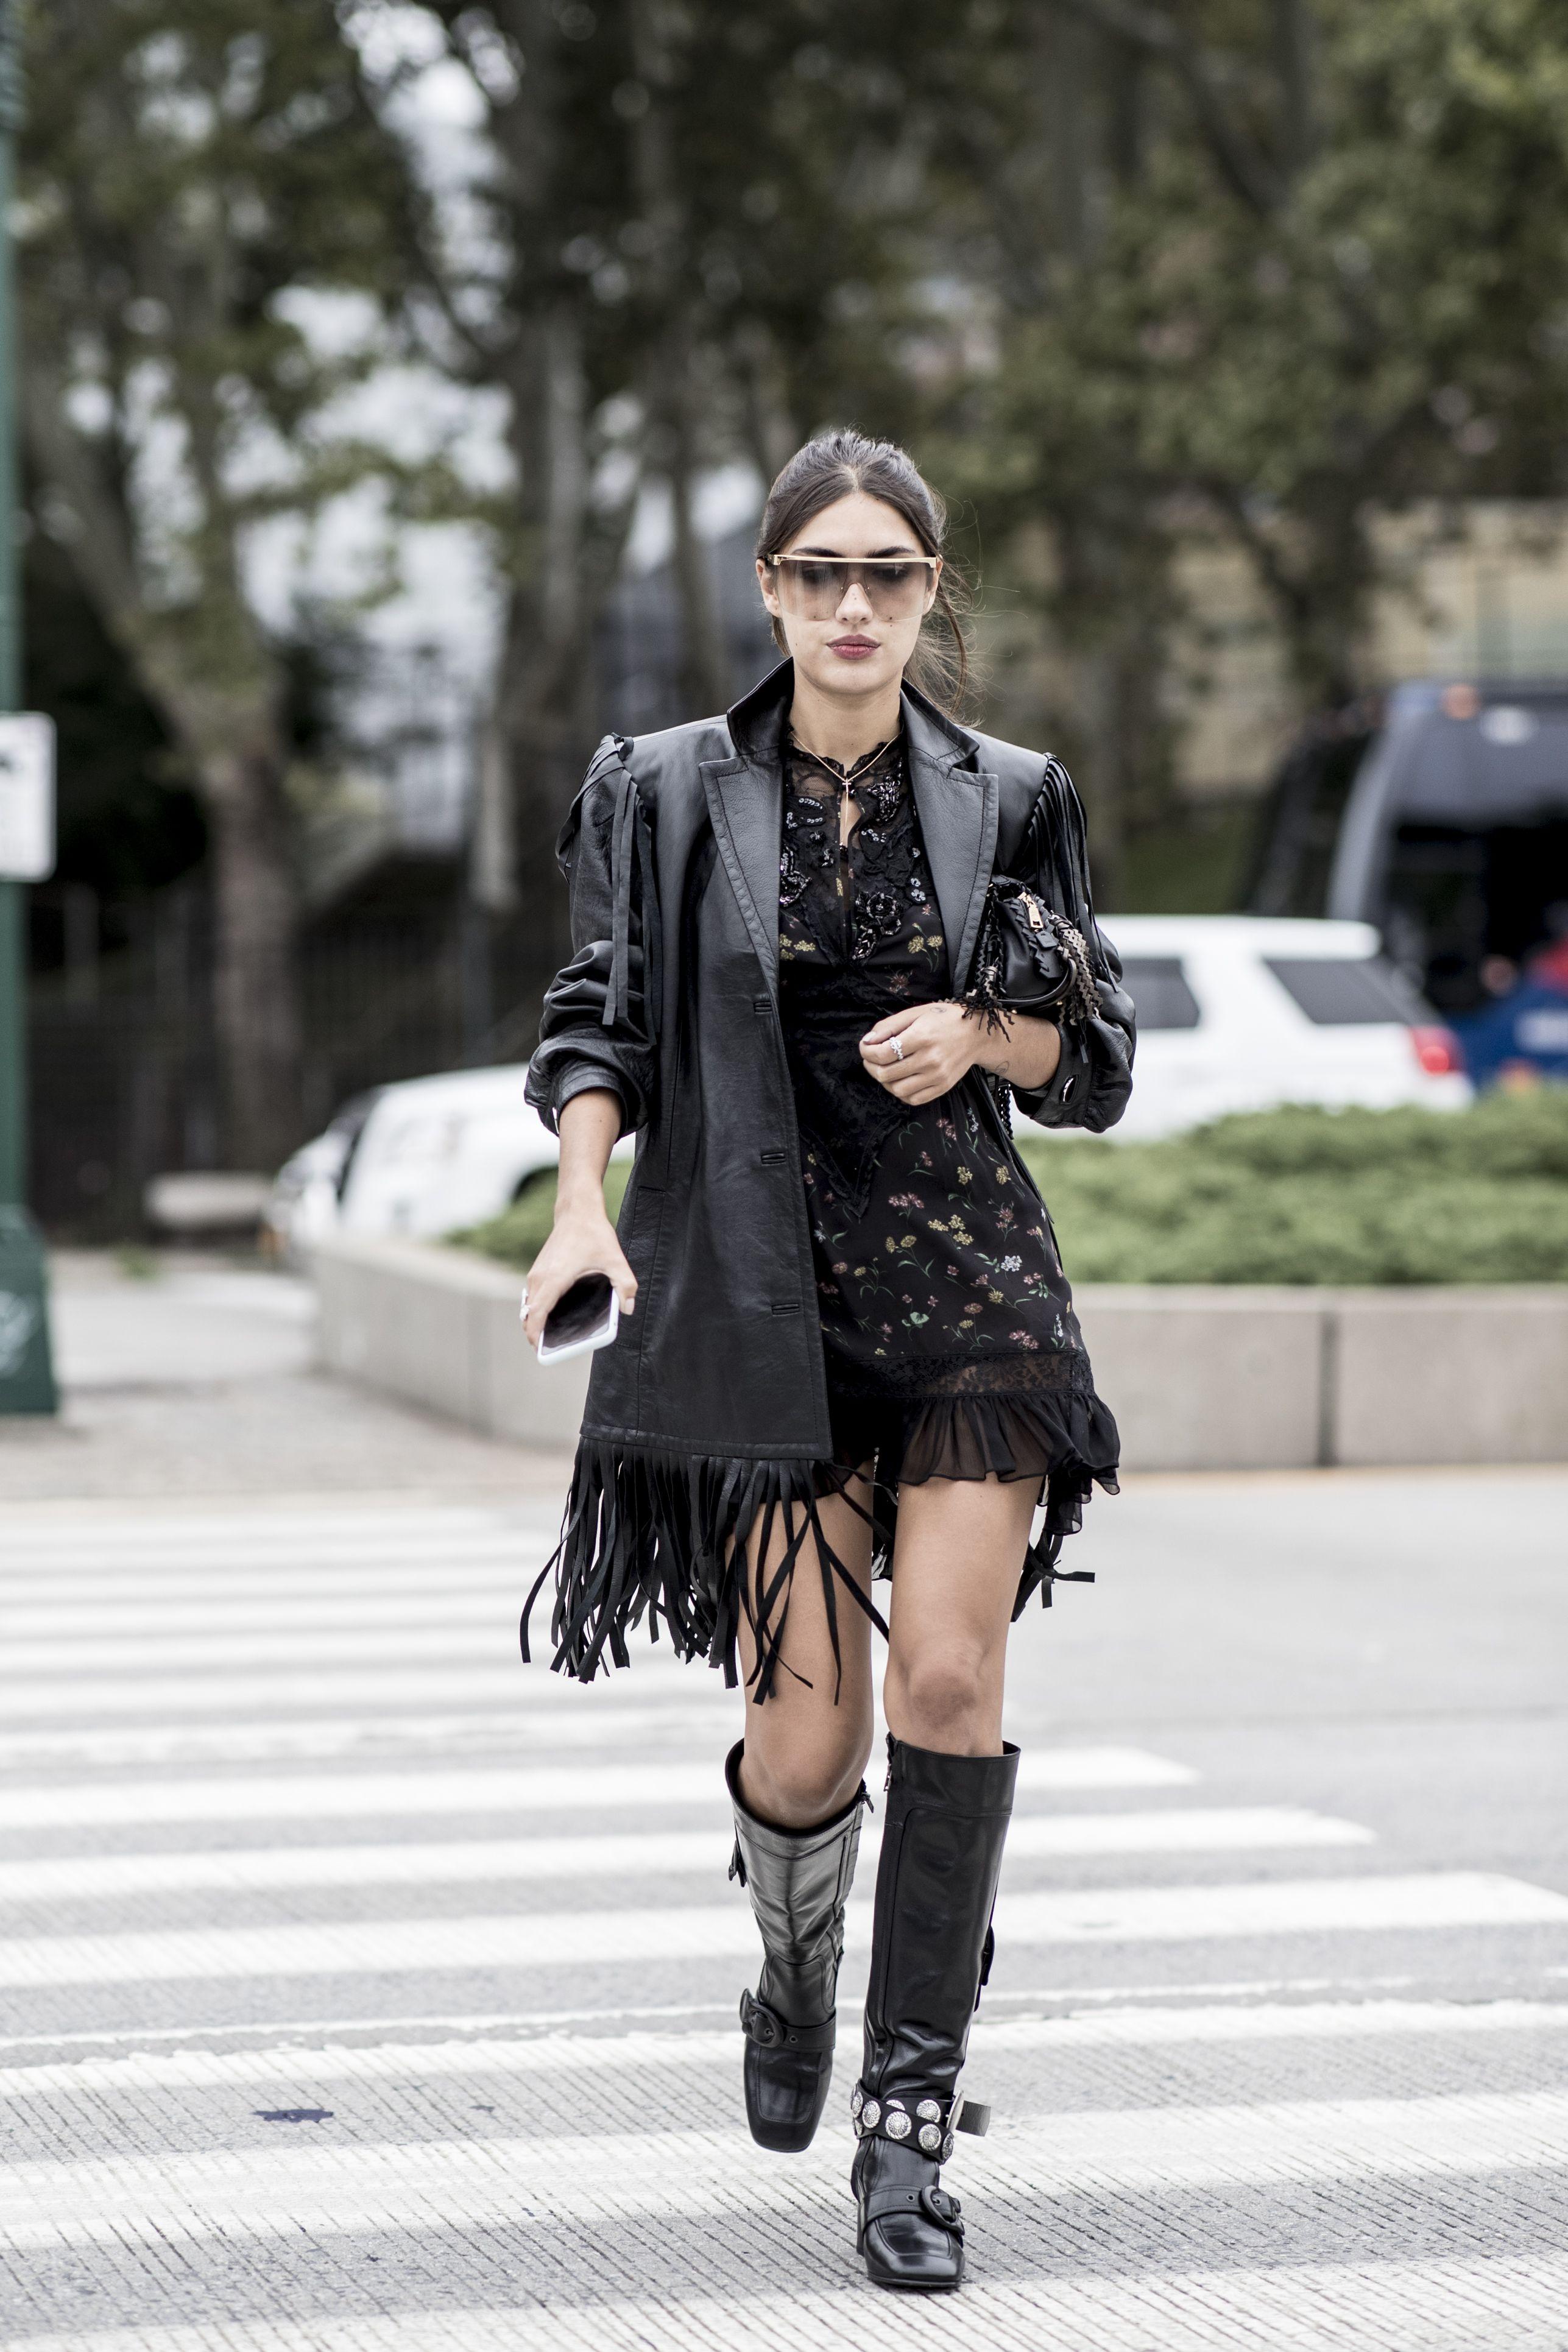 Vestido negro corto con botas altas